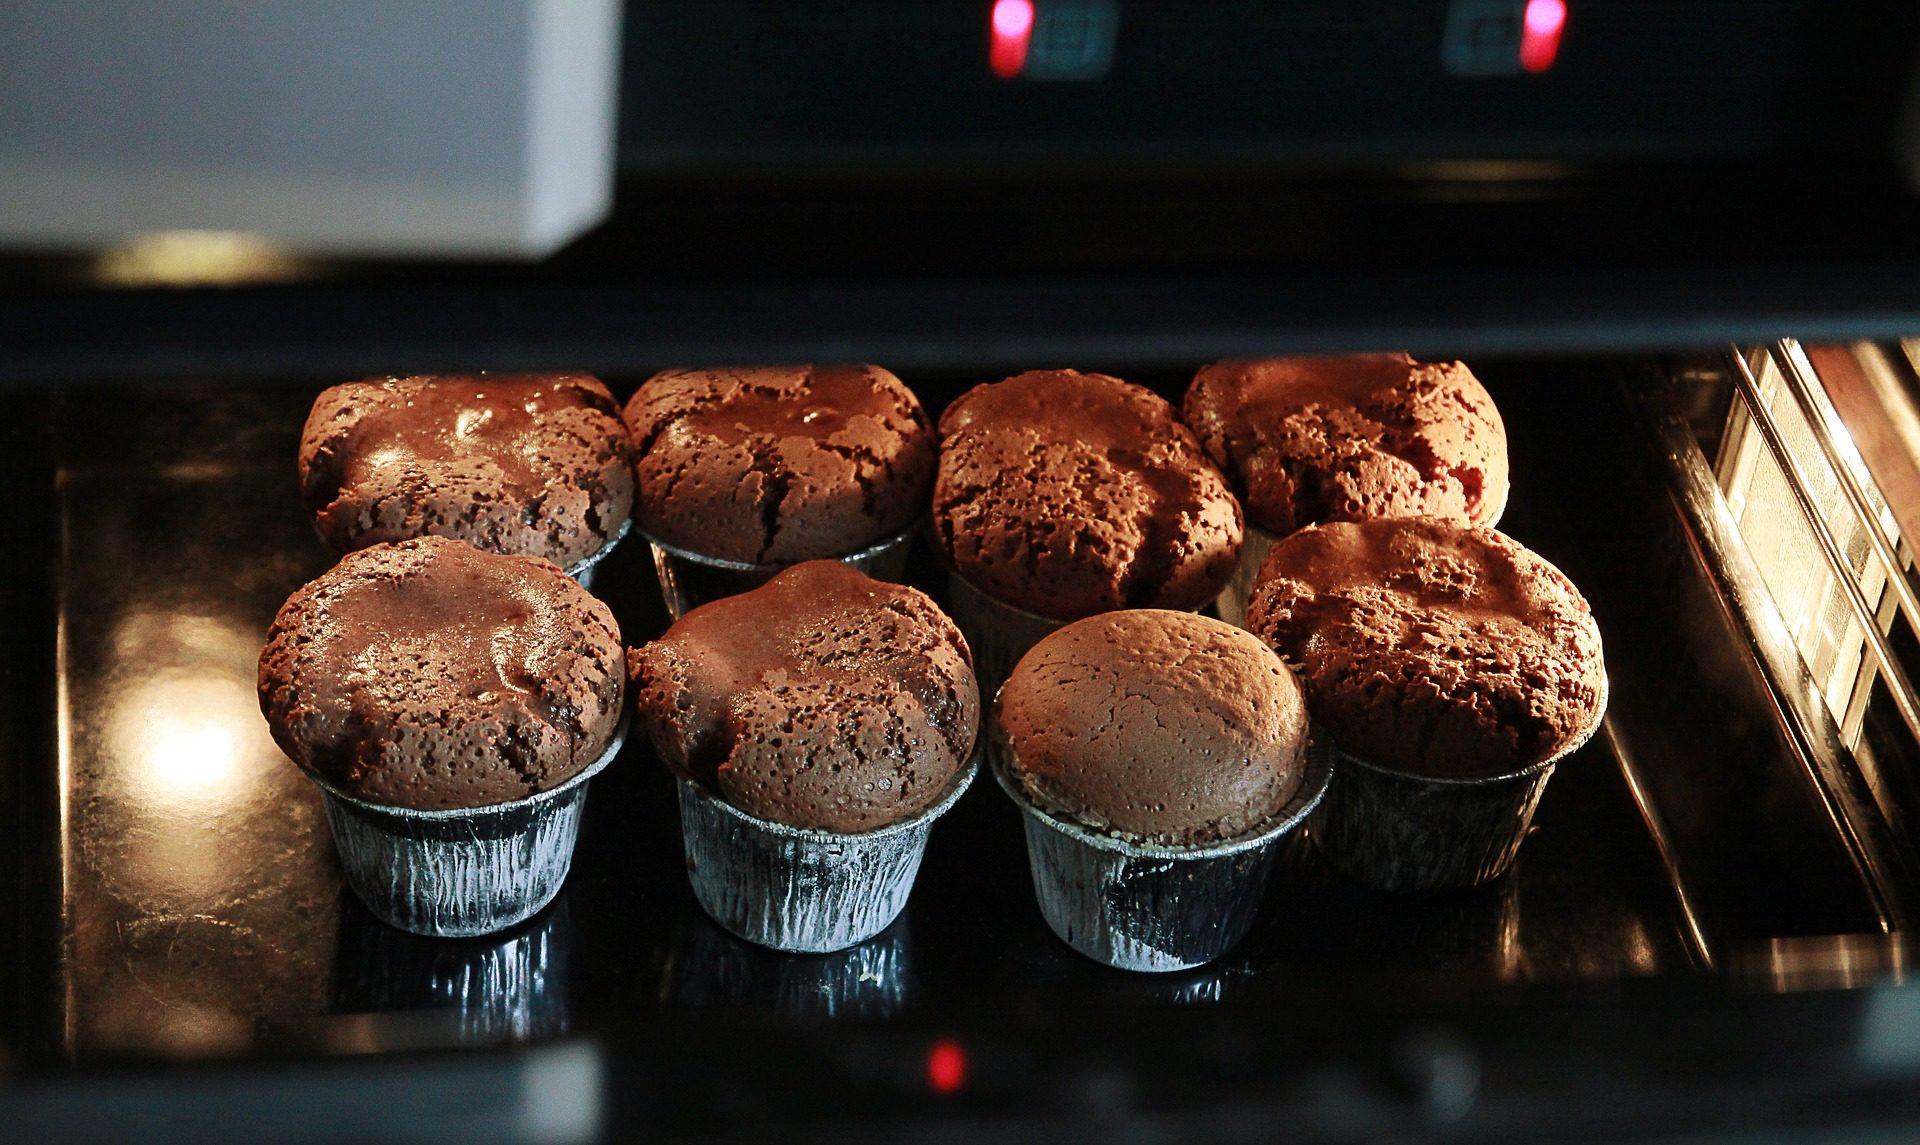 muffins, petits gâteaux, chocolat, four, pâte à tarte, Sweet, cuisine - Fonds d'écran HD - Professor-falken.com